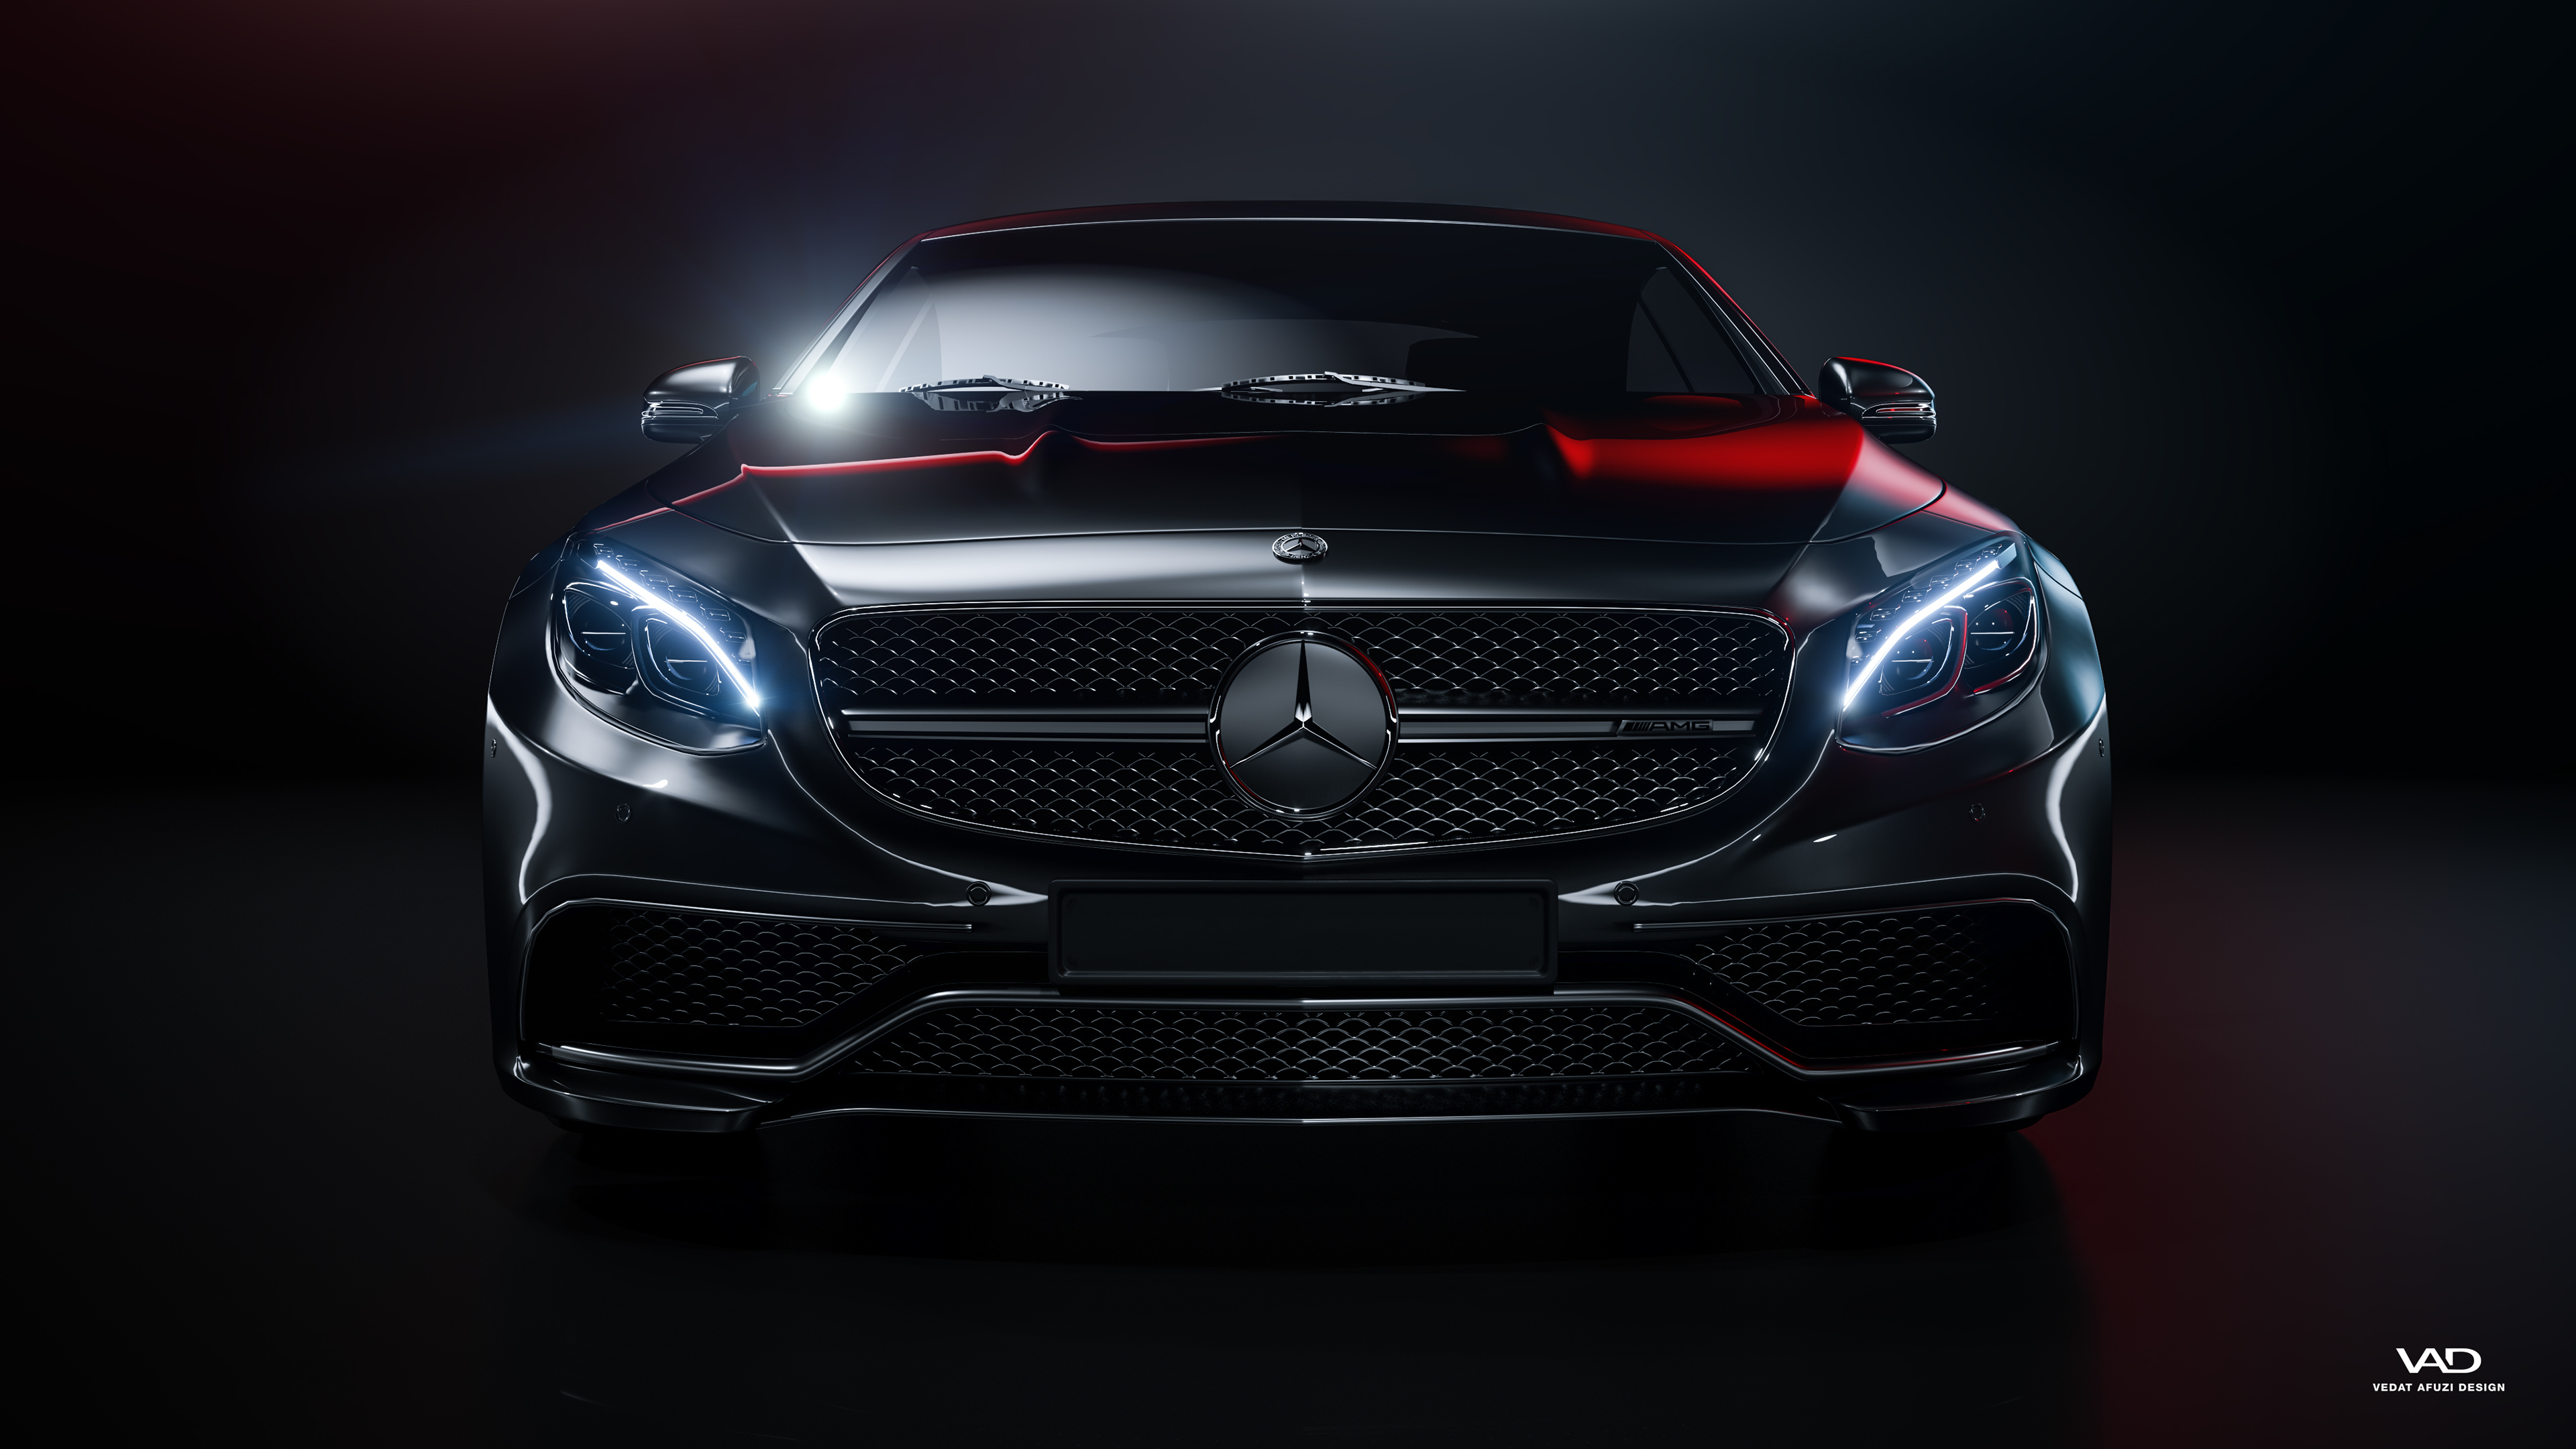 S 63 Amg Wallpaper: Mercedes Benz S 63 AMG 4K Wallpaper